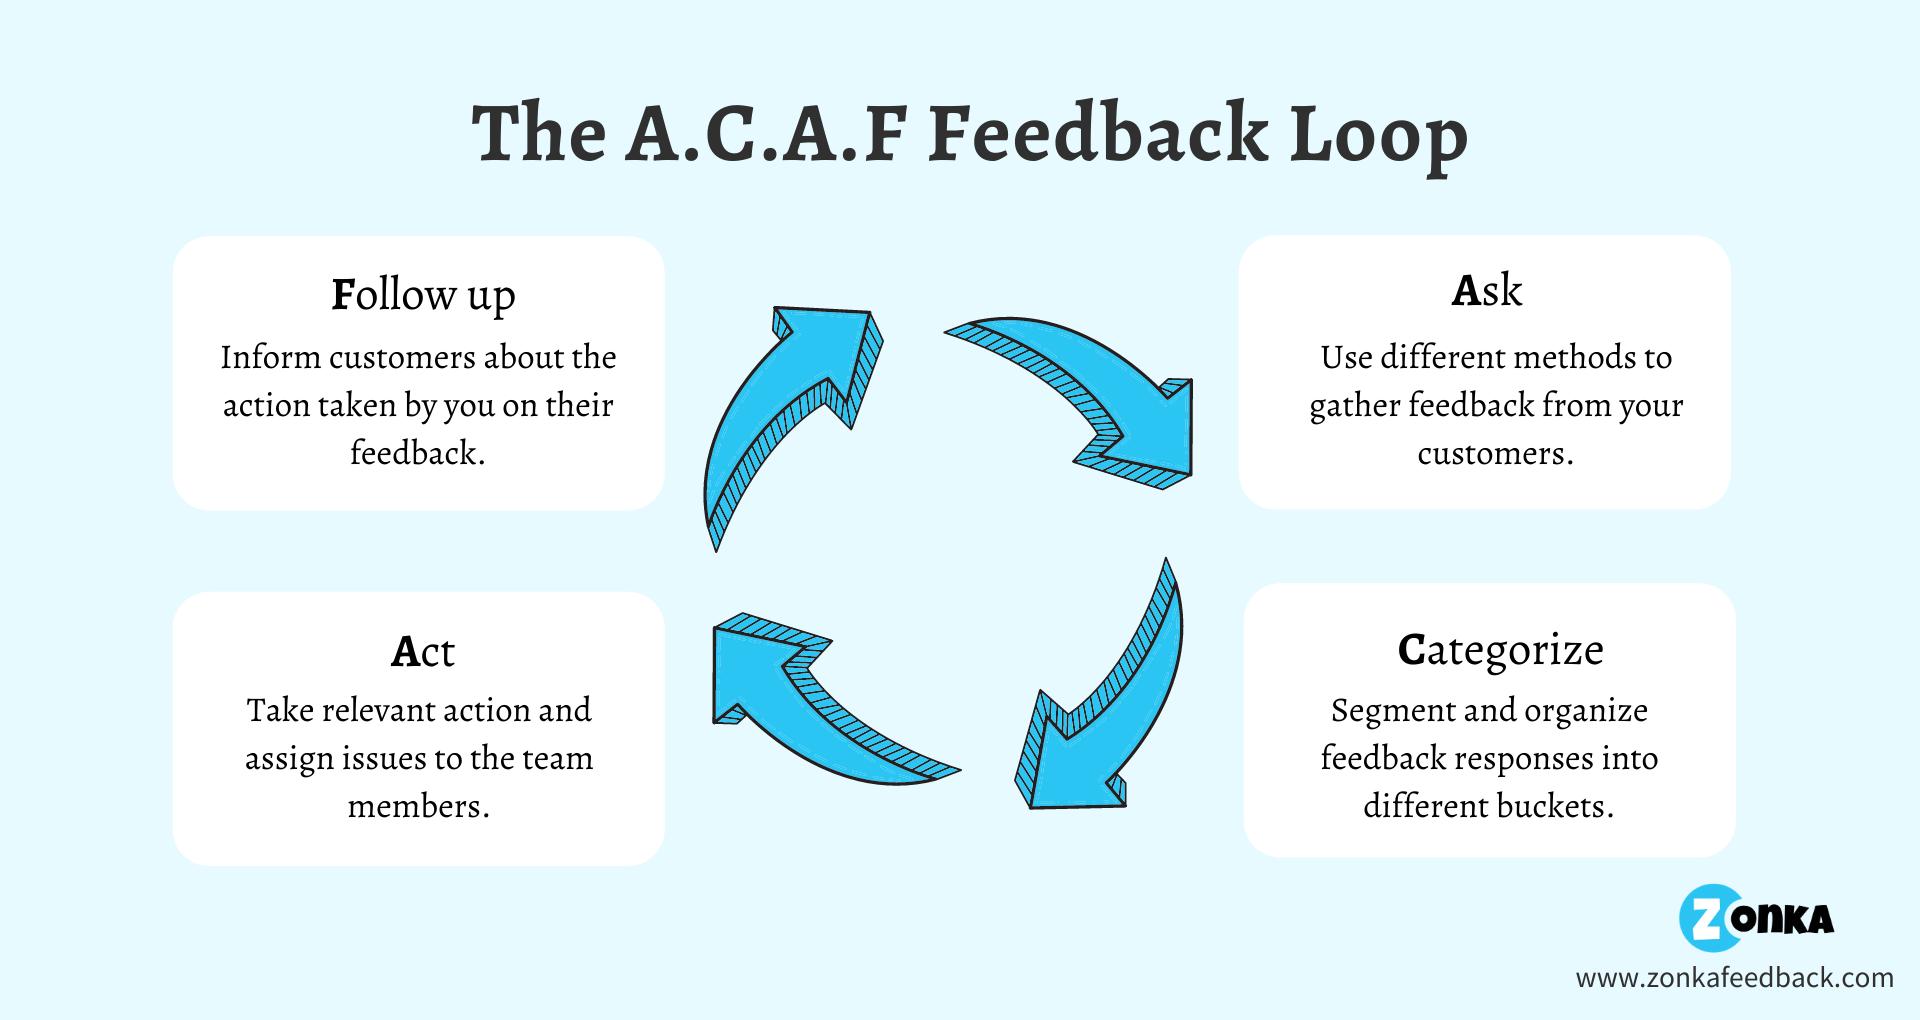 The A.C.A.F Feedback Loop